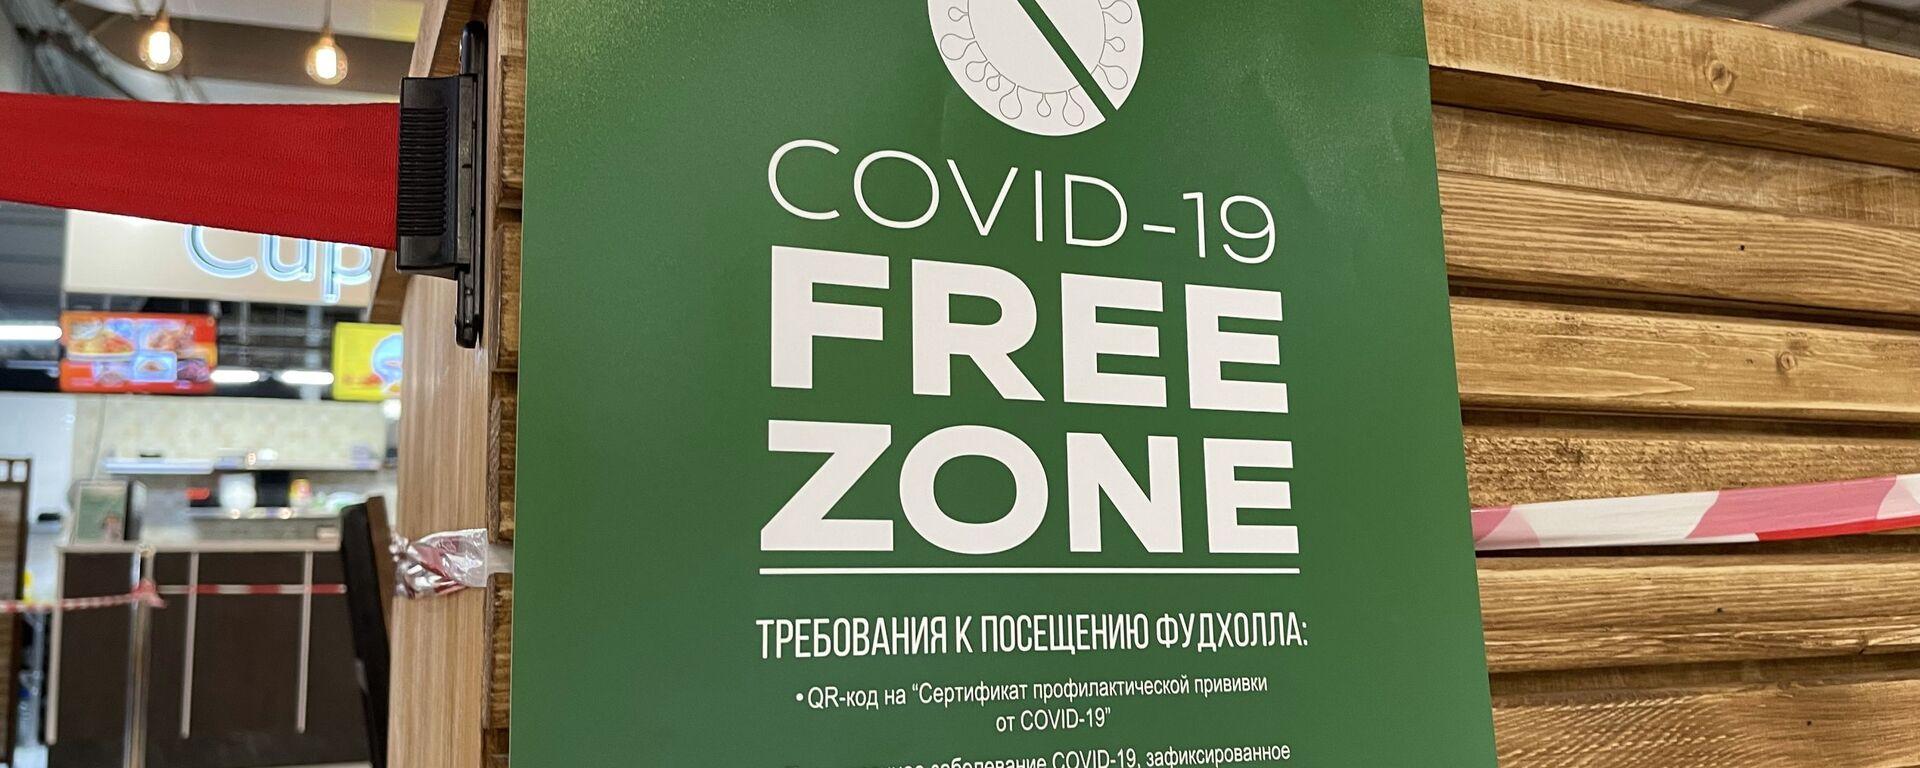 COVID-19 free zone - Sputnik Polska, 1920, 31.07.2021